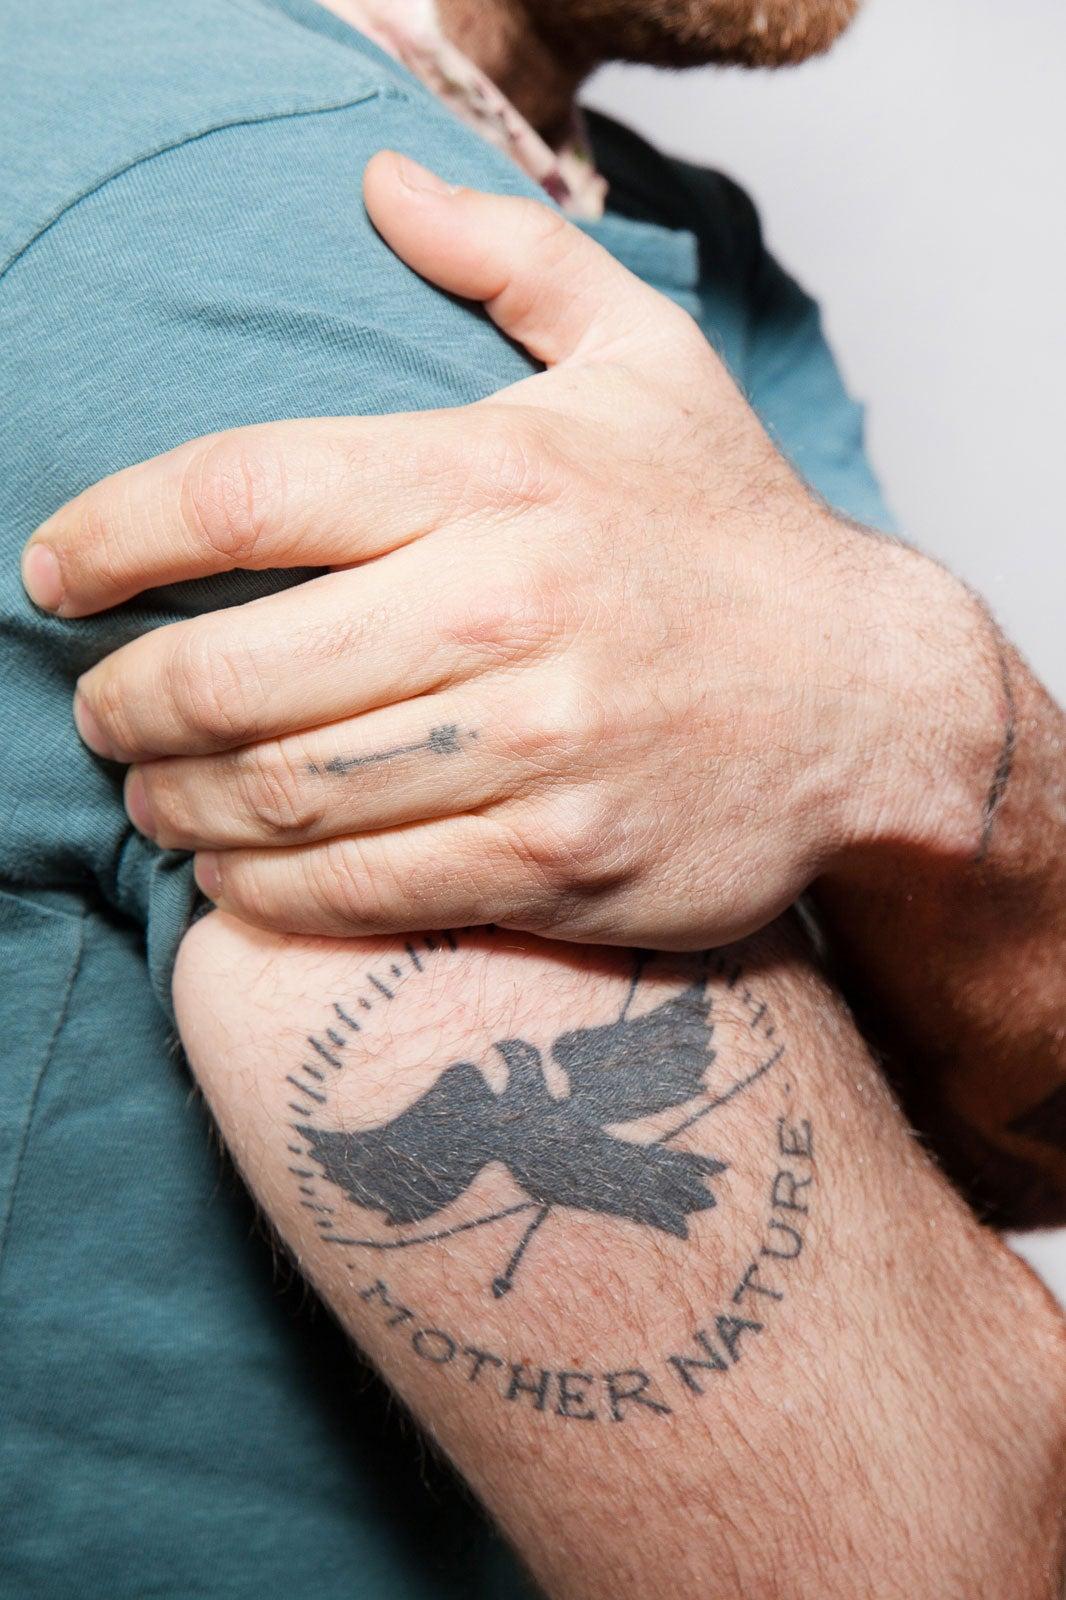 Best Tattoos In San Francisco – Tastemaker Body Art